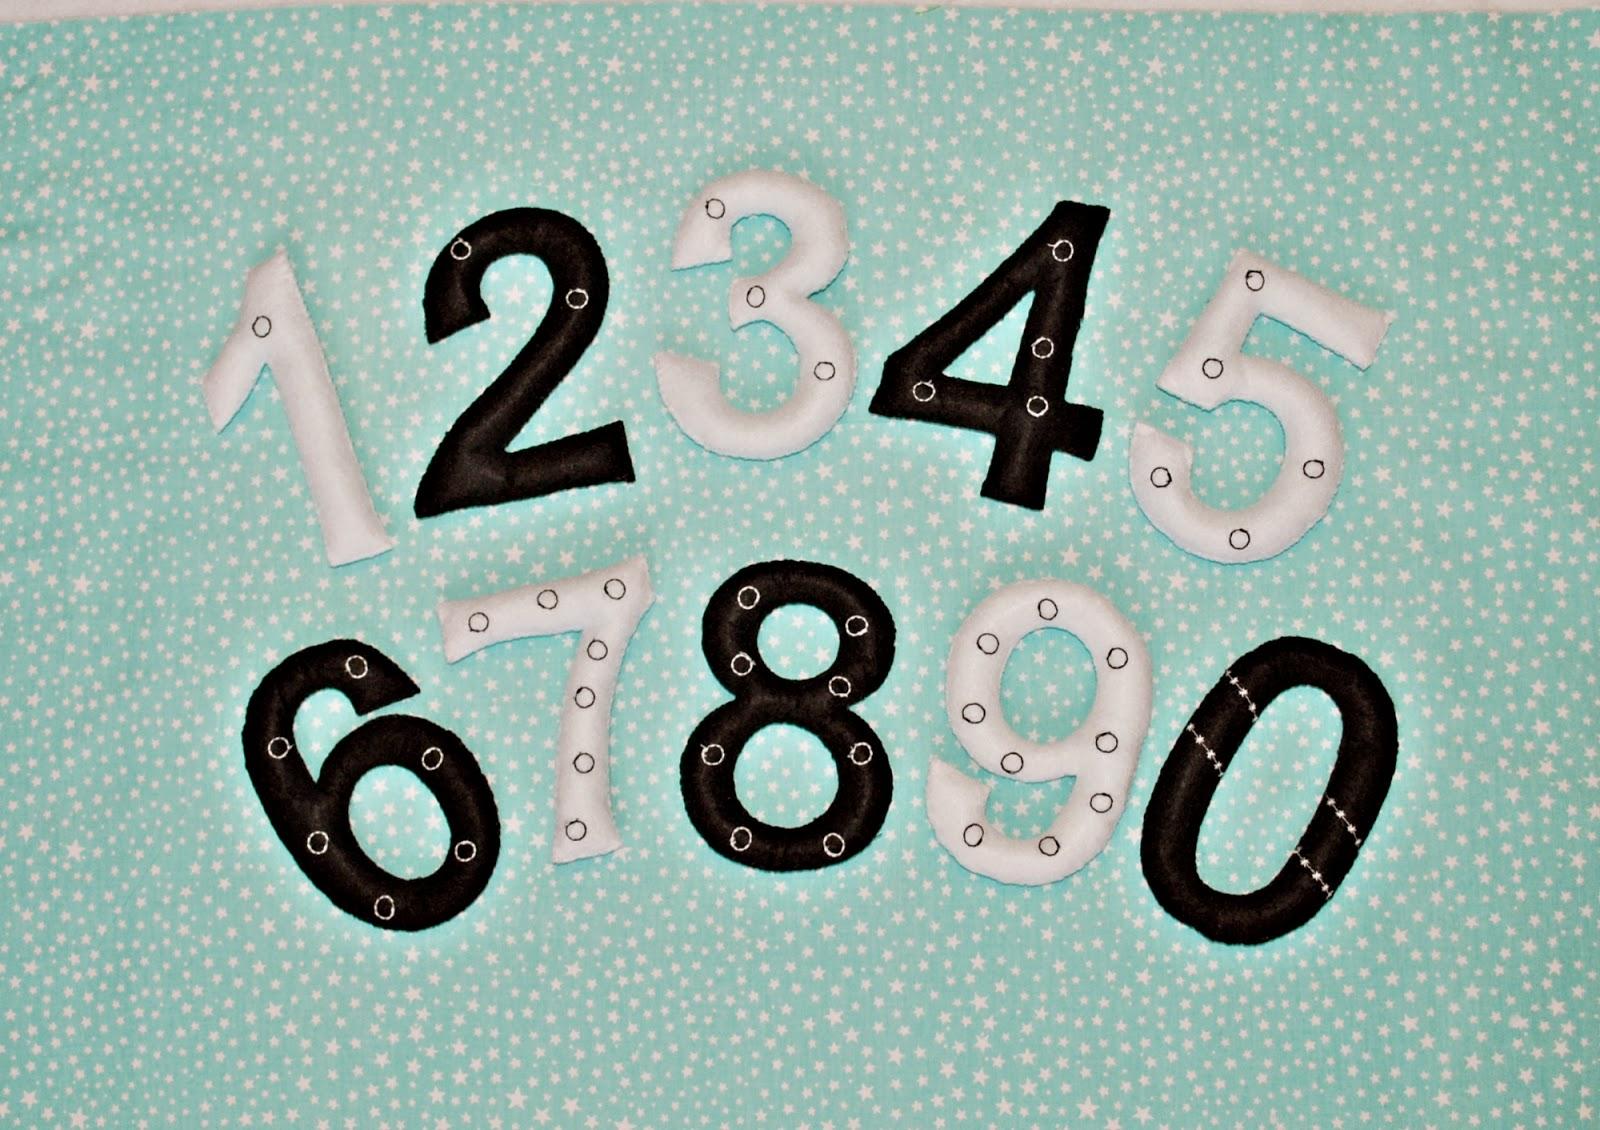 наборы цифр из фетра